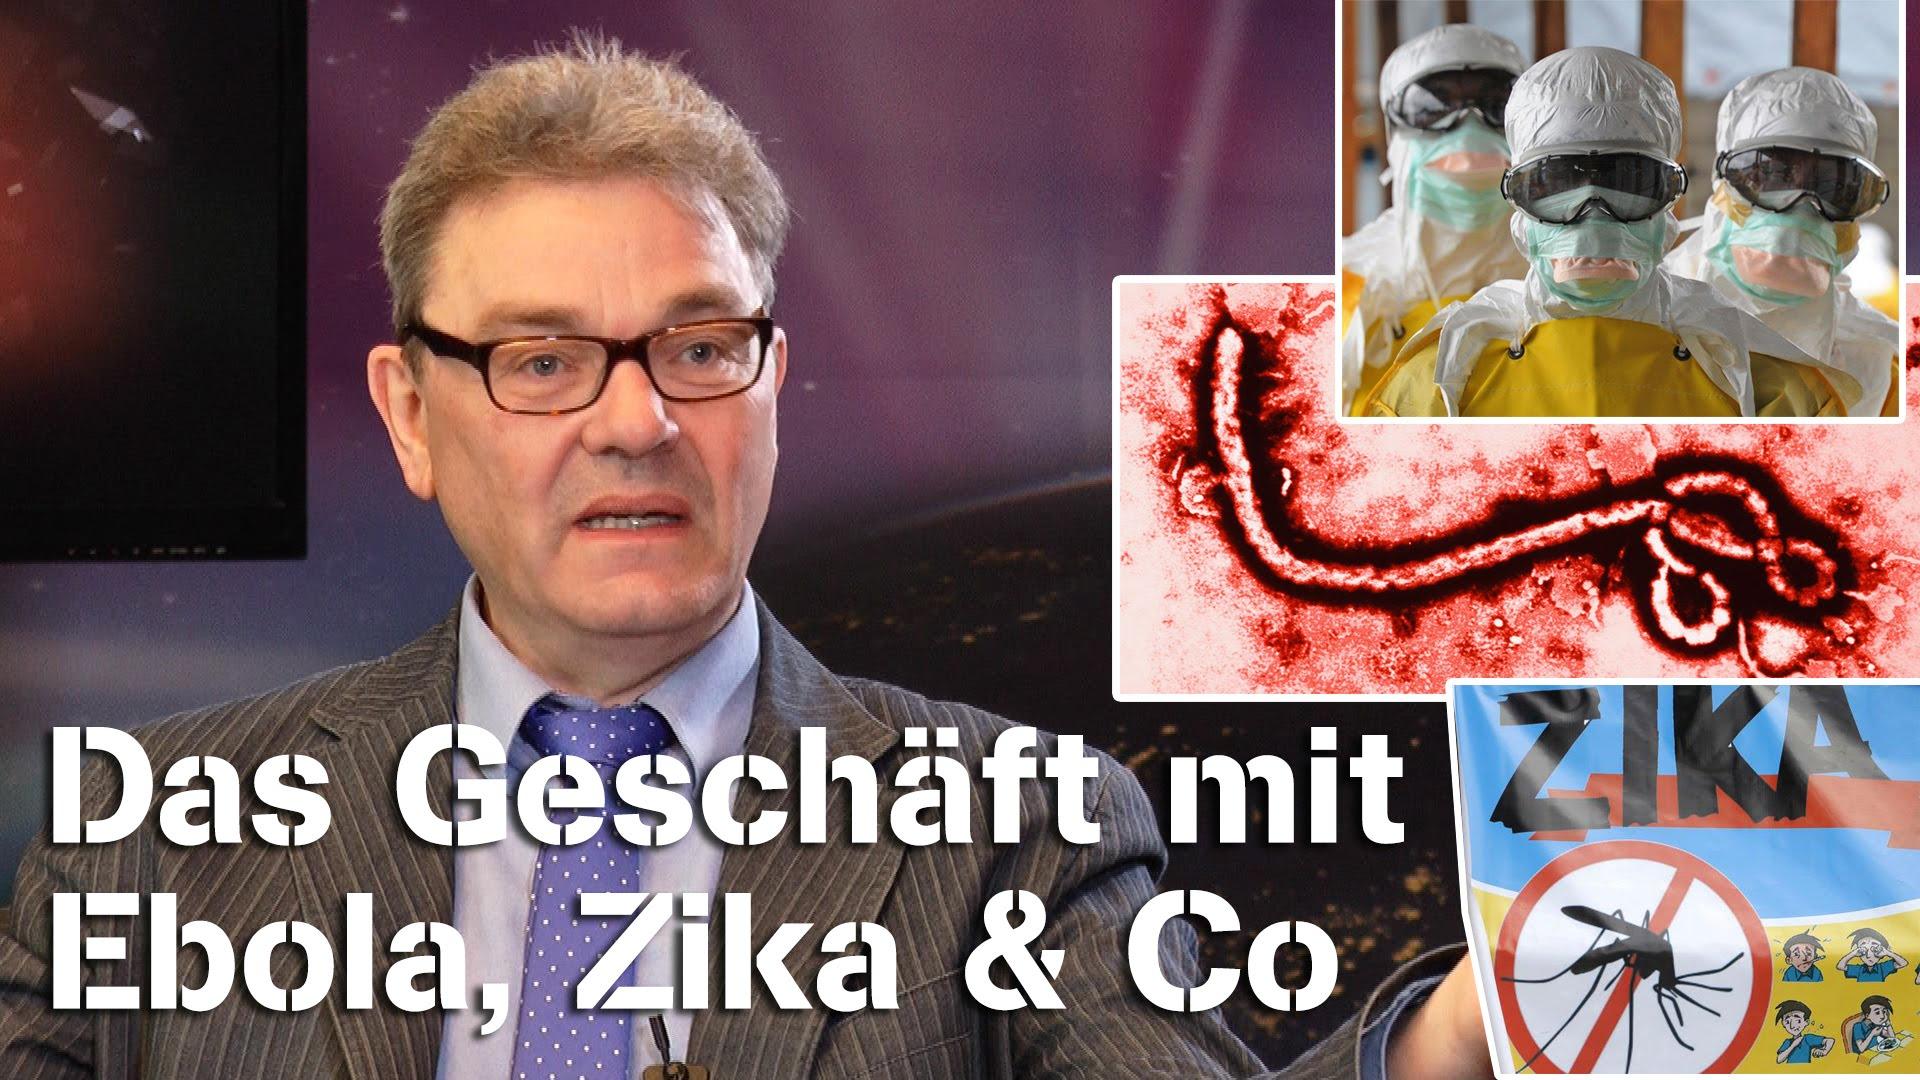 Das Geschäft mit Ebola, Zika & Co – Hans U. P. Tolzin im NuoViso Talk